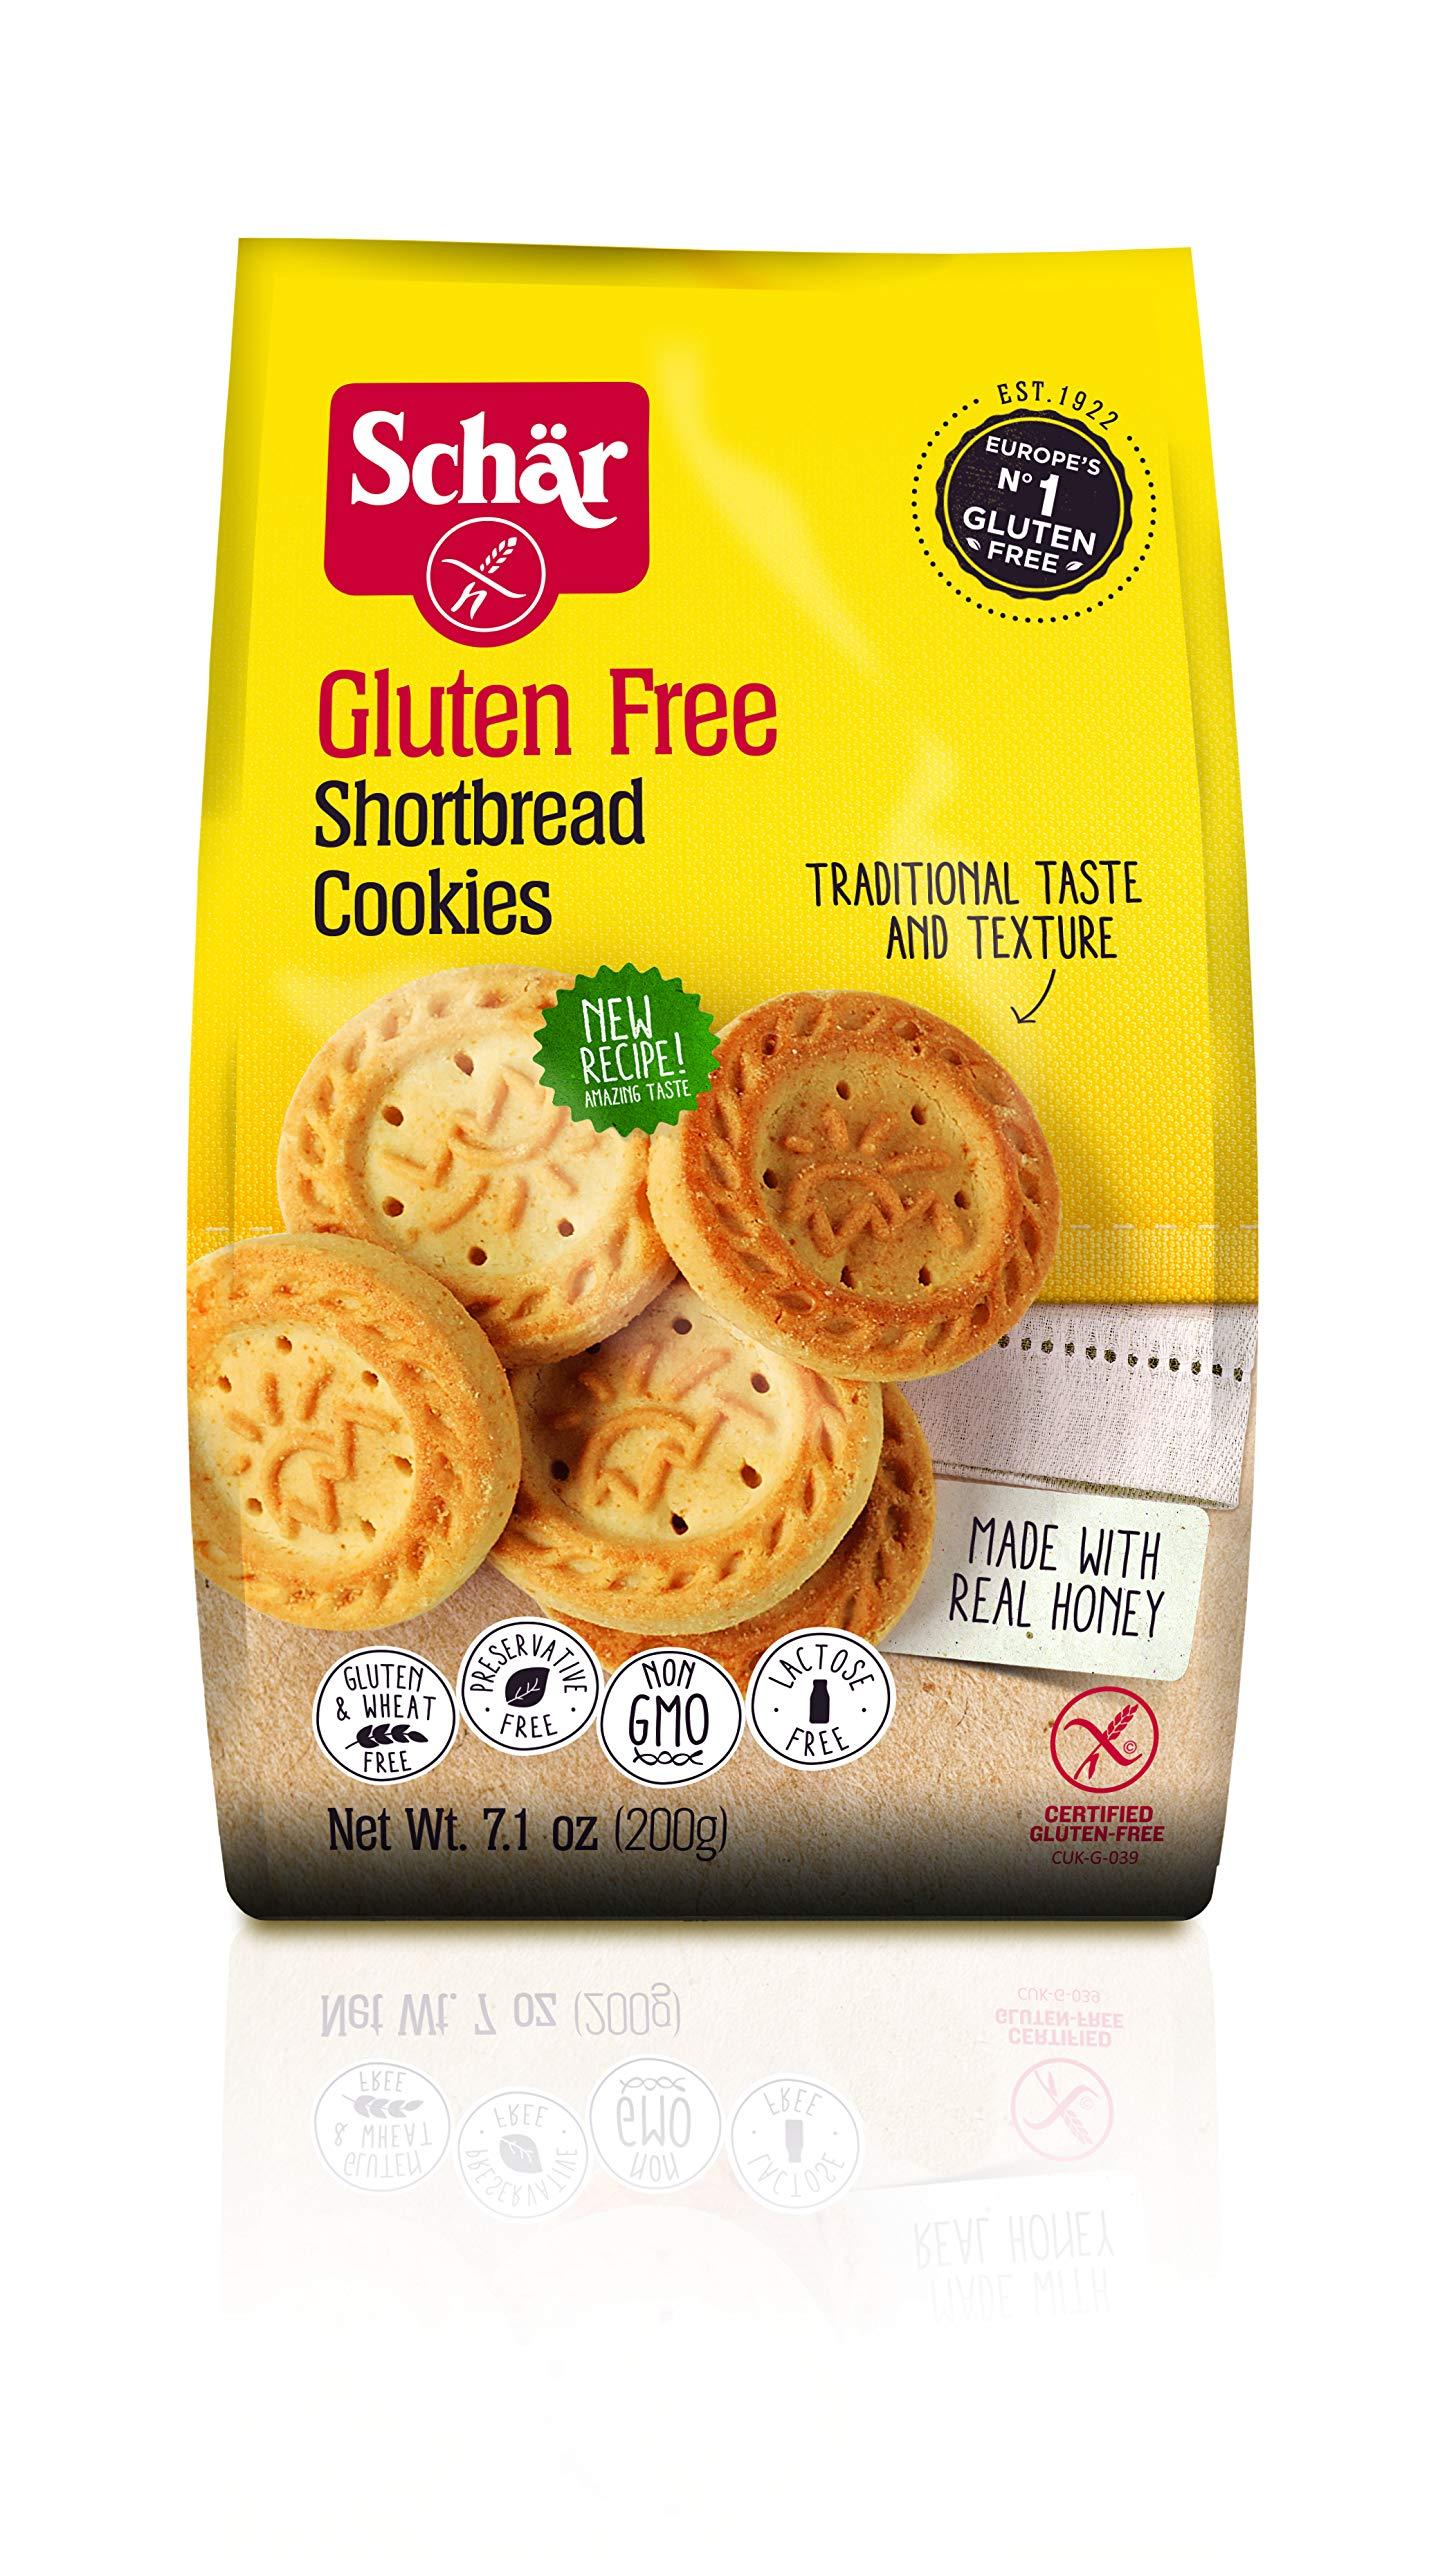 Schär Gluten Free Shortbread Cookies, 7 oz, 6-Pack